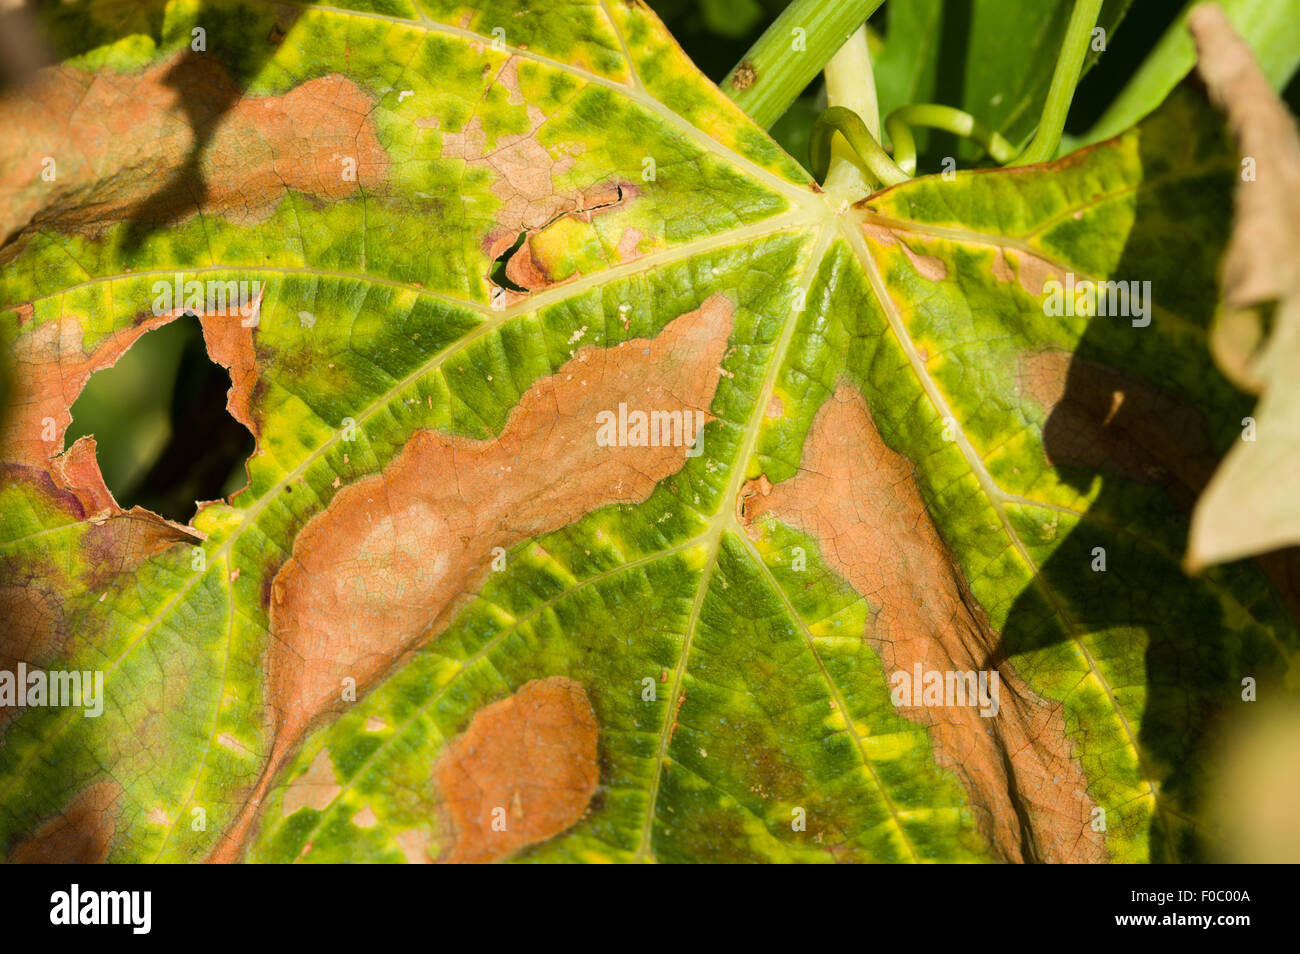 pierces-disease-xylella-fastidiosa-typic